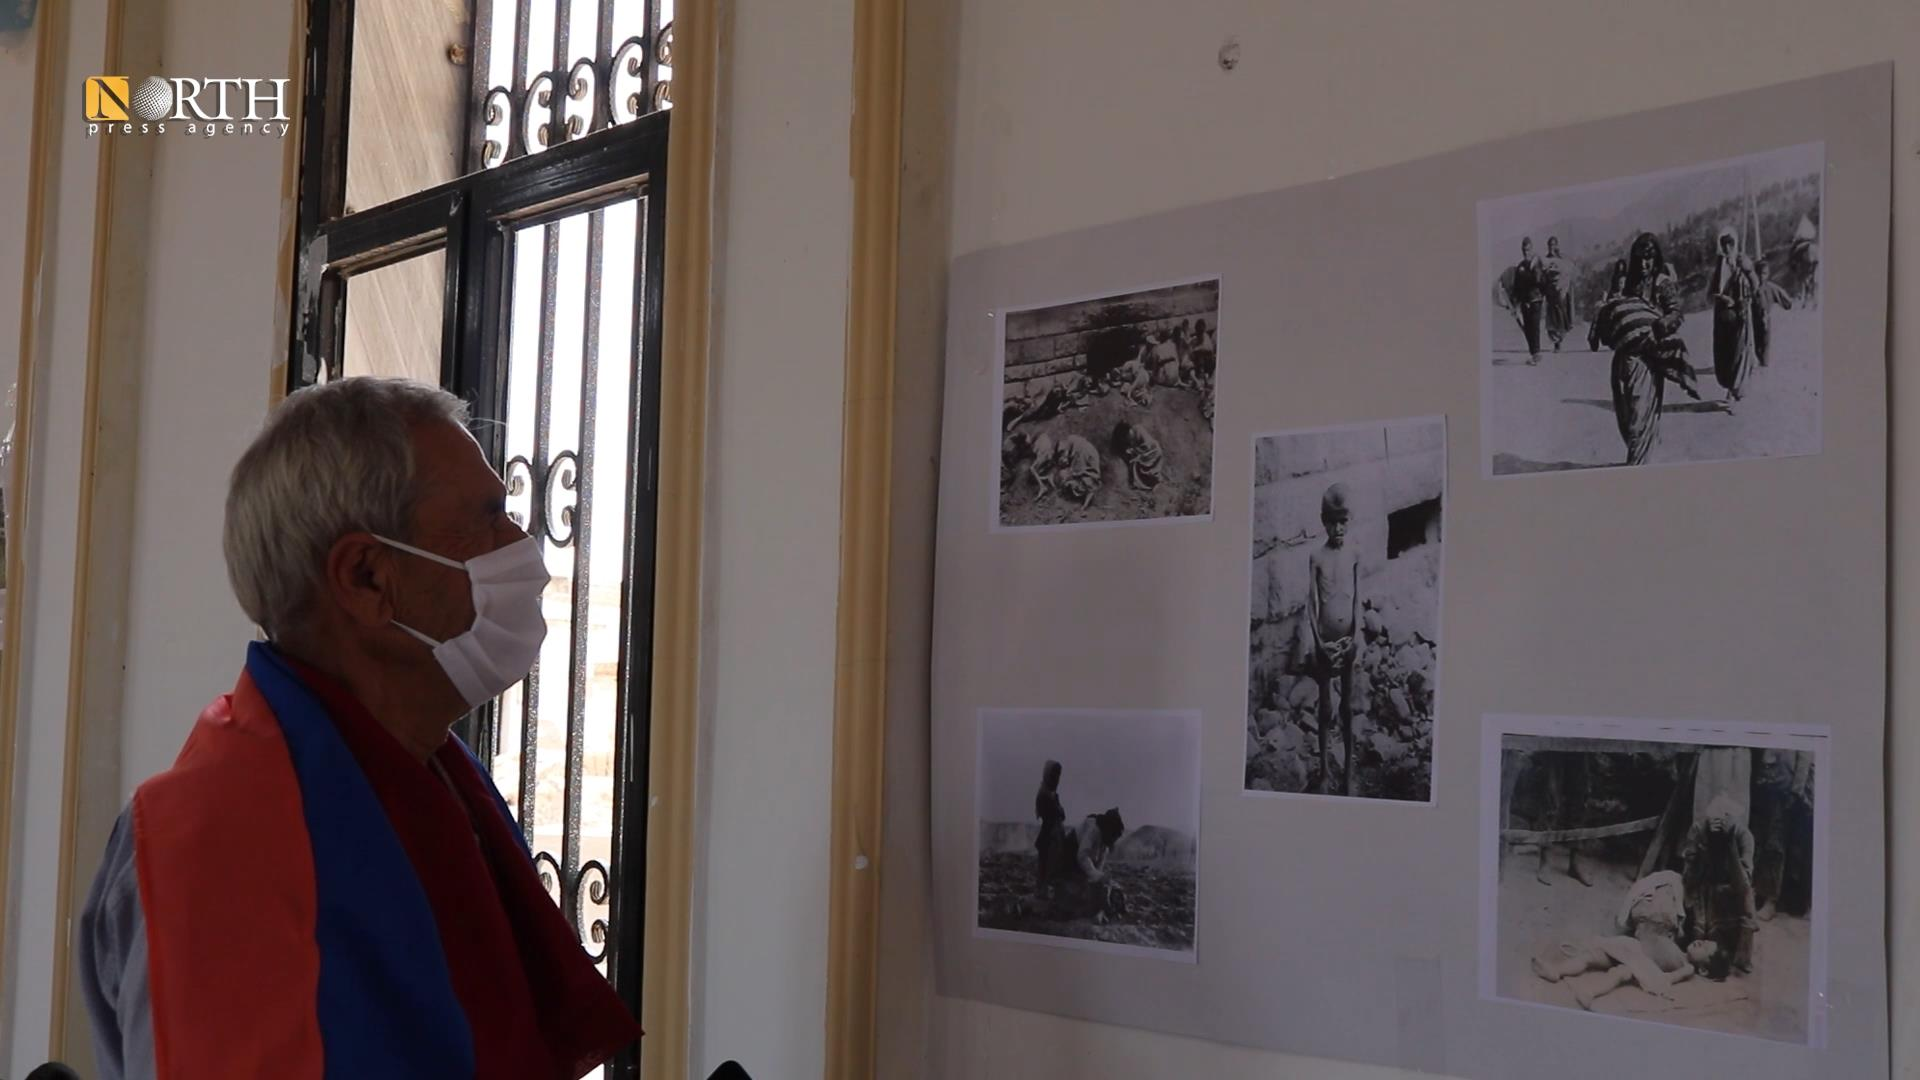 Armenians commemorate the genocide in Tel Goran village - North Press